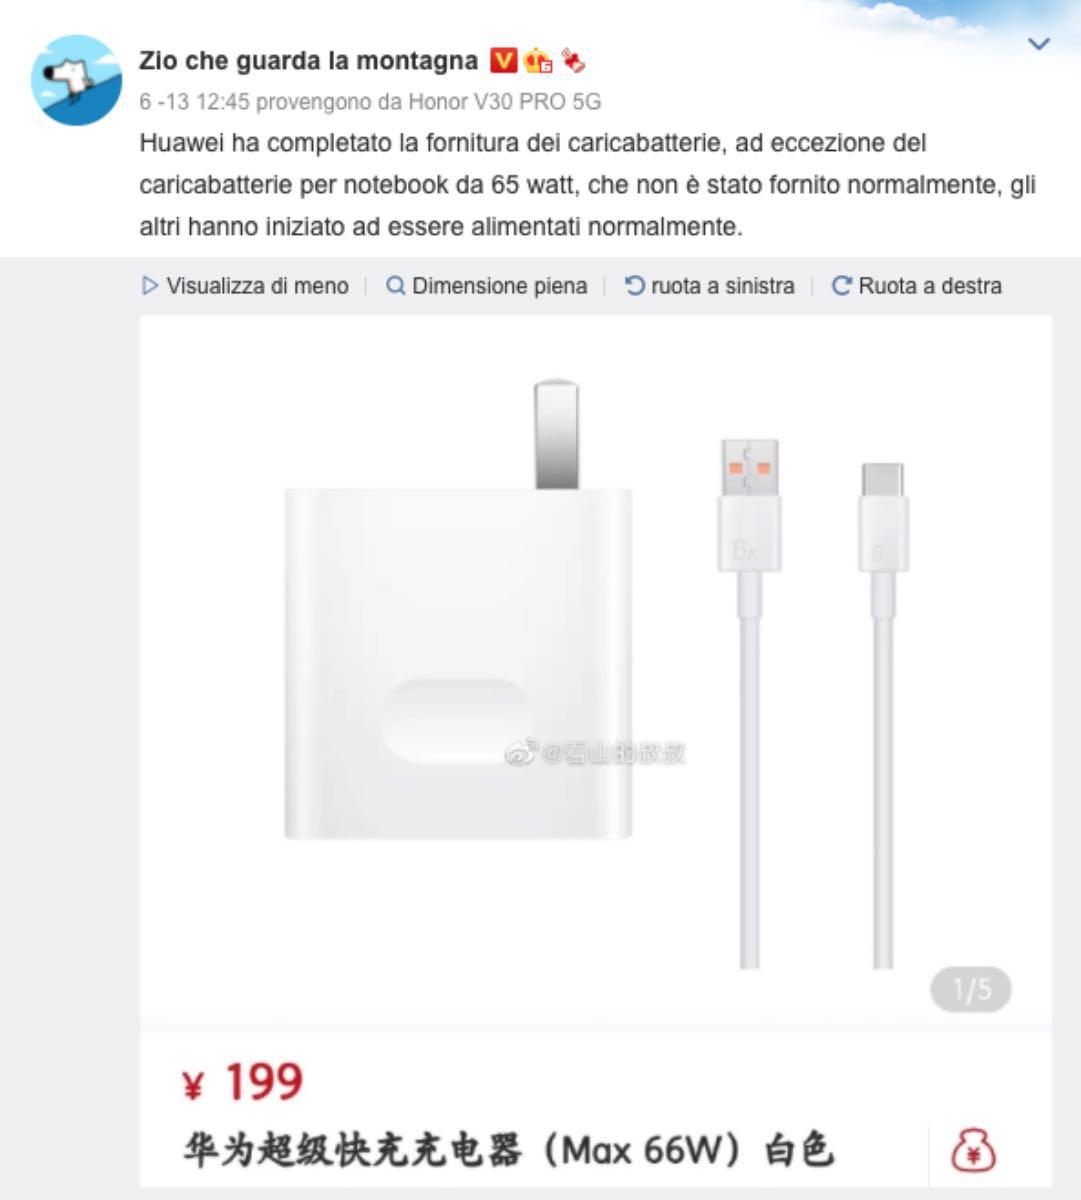 huawei fornitura caricabatterie smartphone ripresa